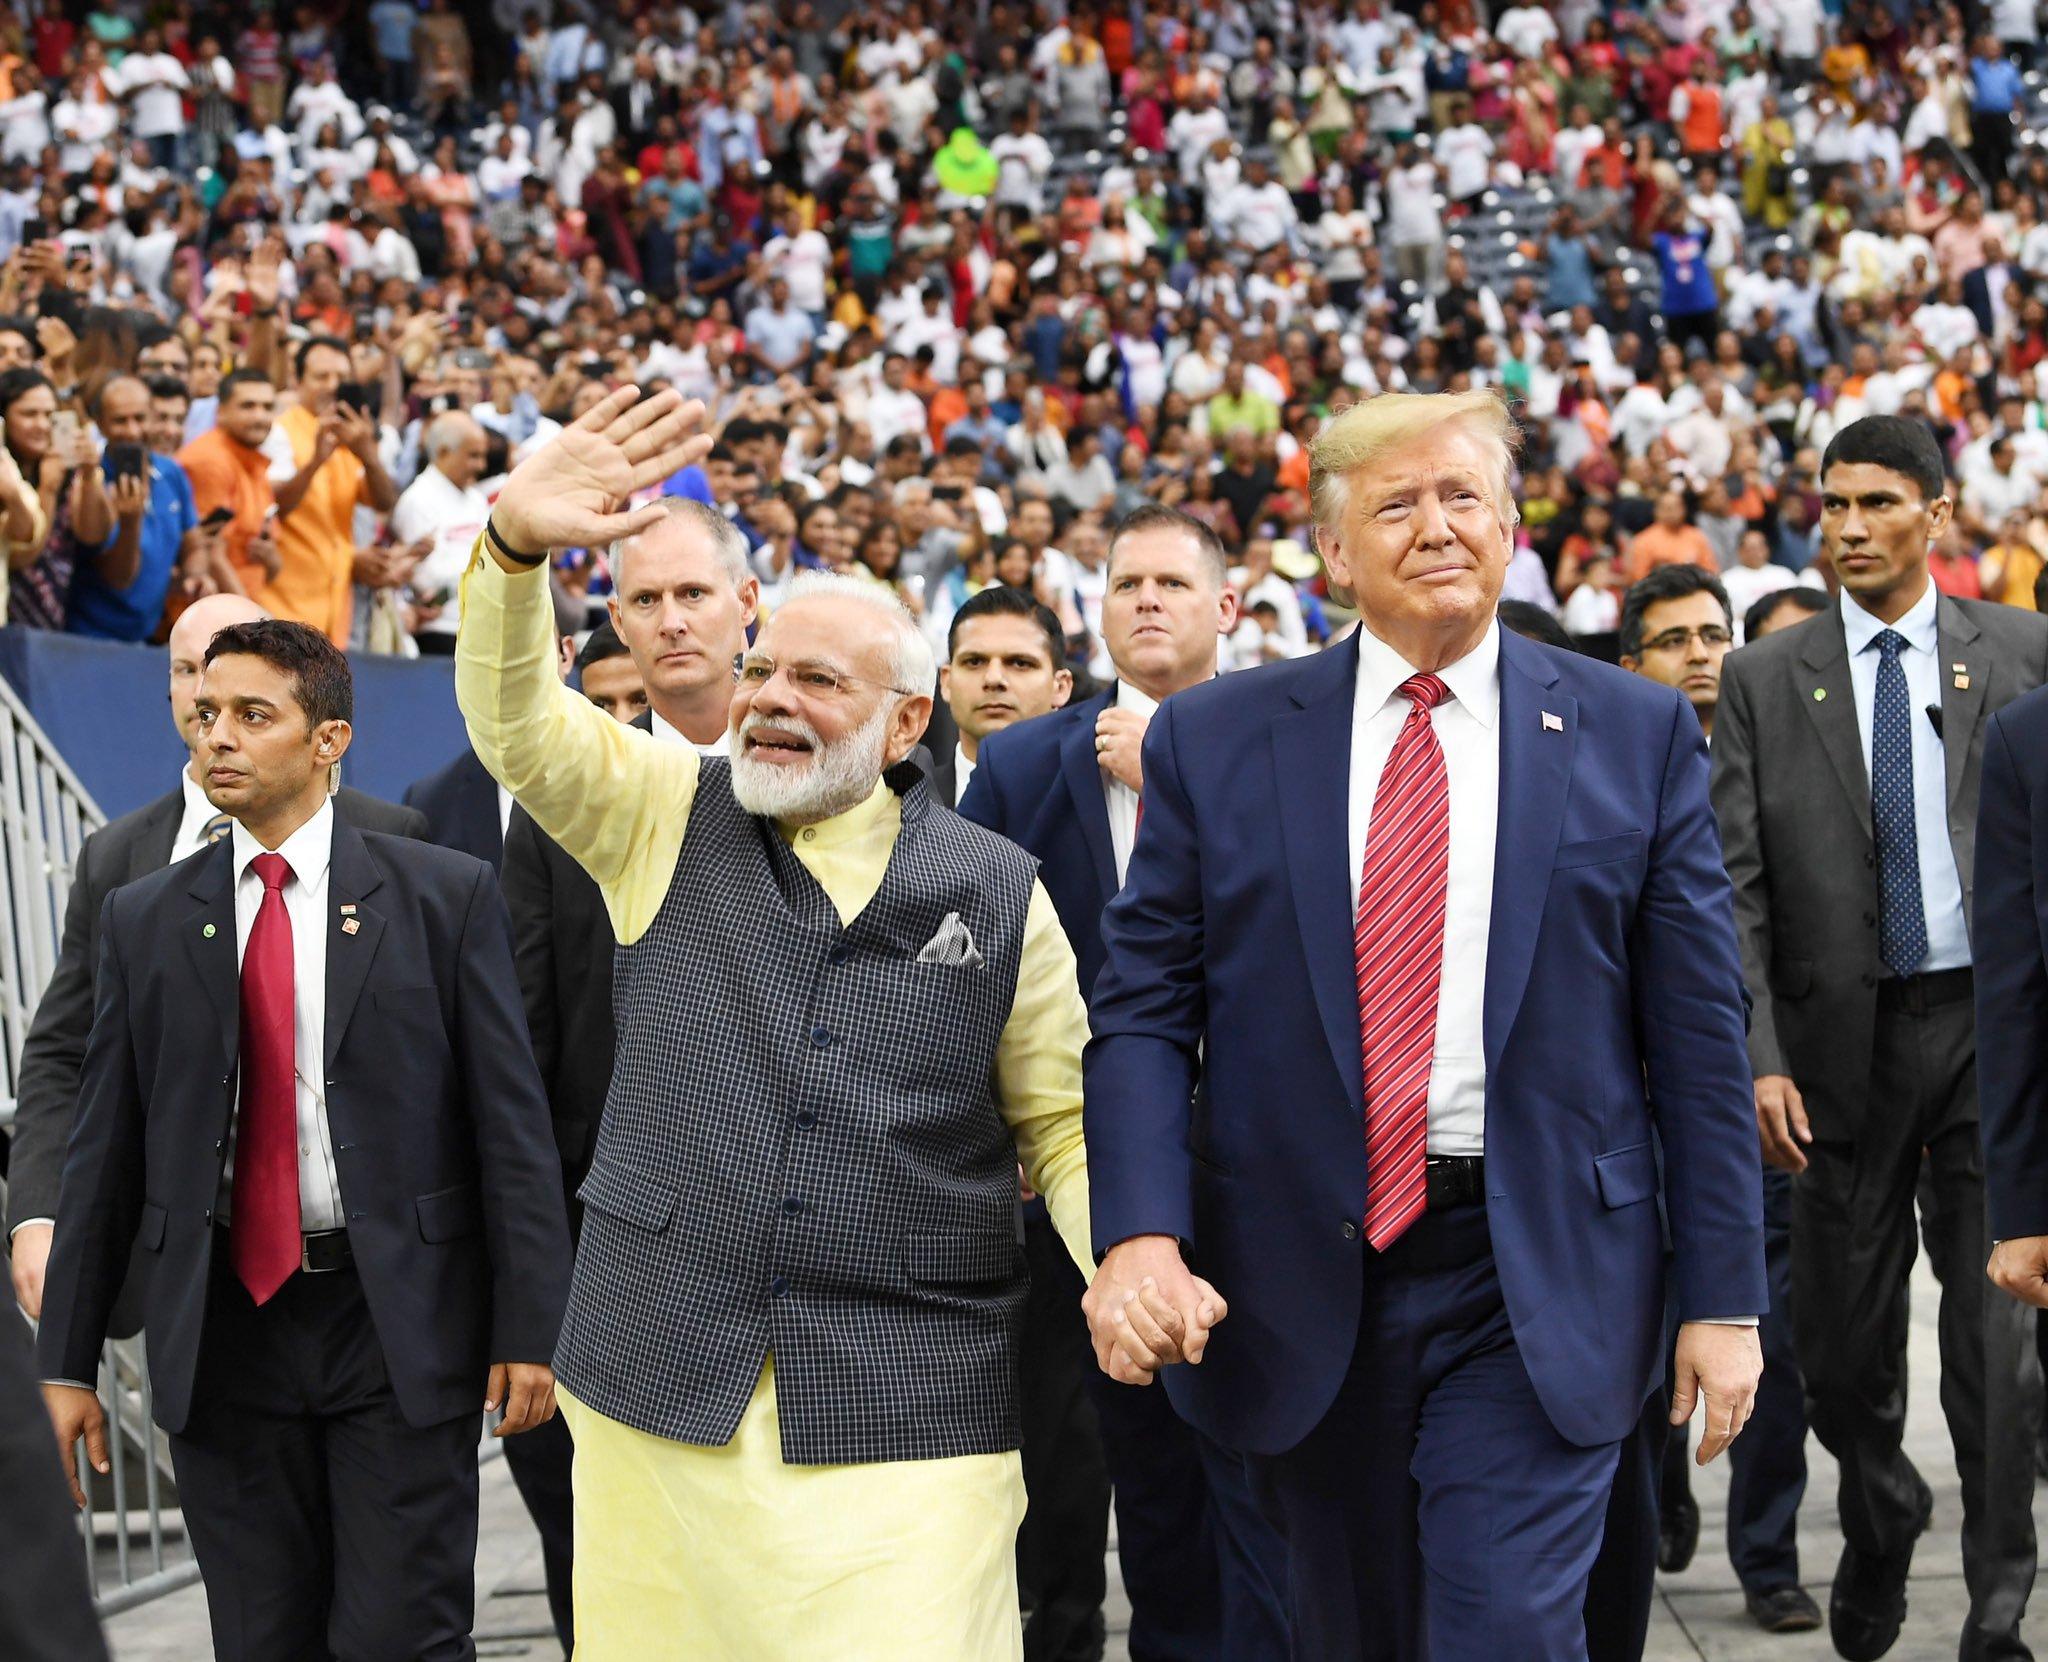 Donald Trump and Narendra Modi greeting the Indian diaspora at the Howdy, Modi event in USA last year. Photo courtesy: Twitter/@narendramodi